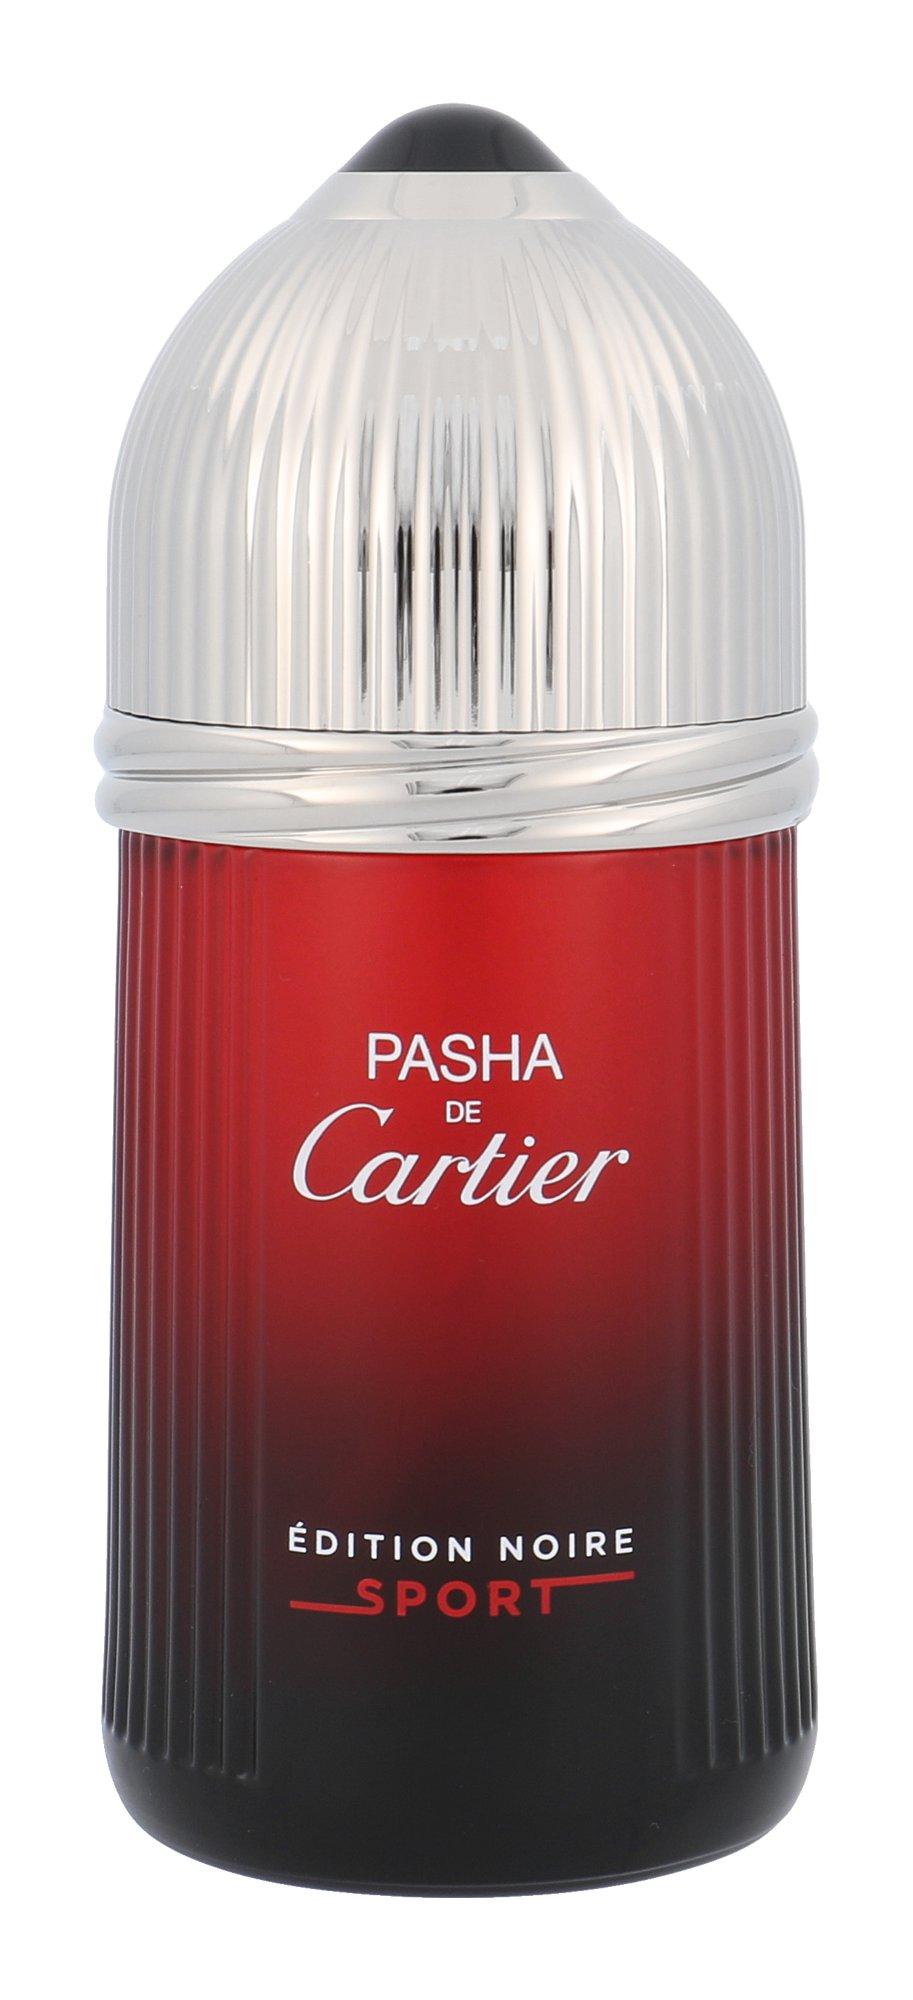 Cartier Pasha De Cartier Edition Noire Sport, Toaletná voda 100ml